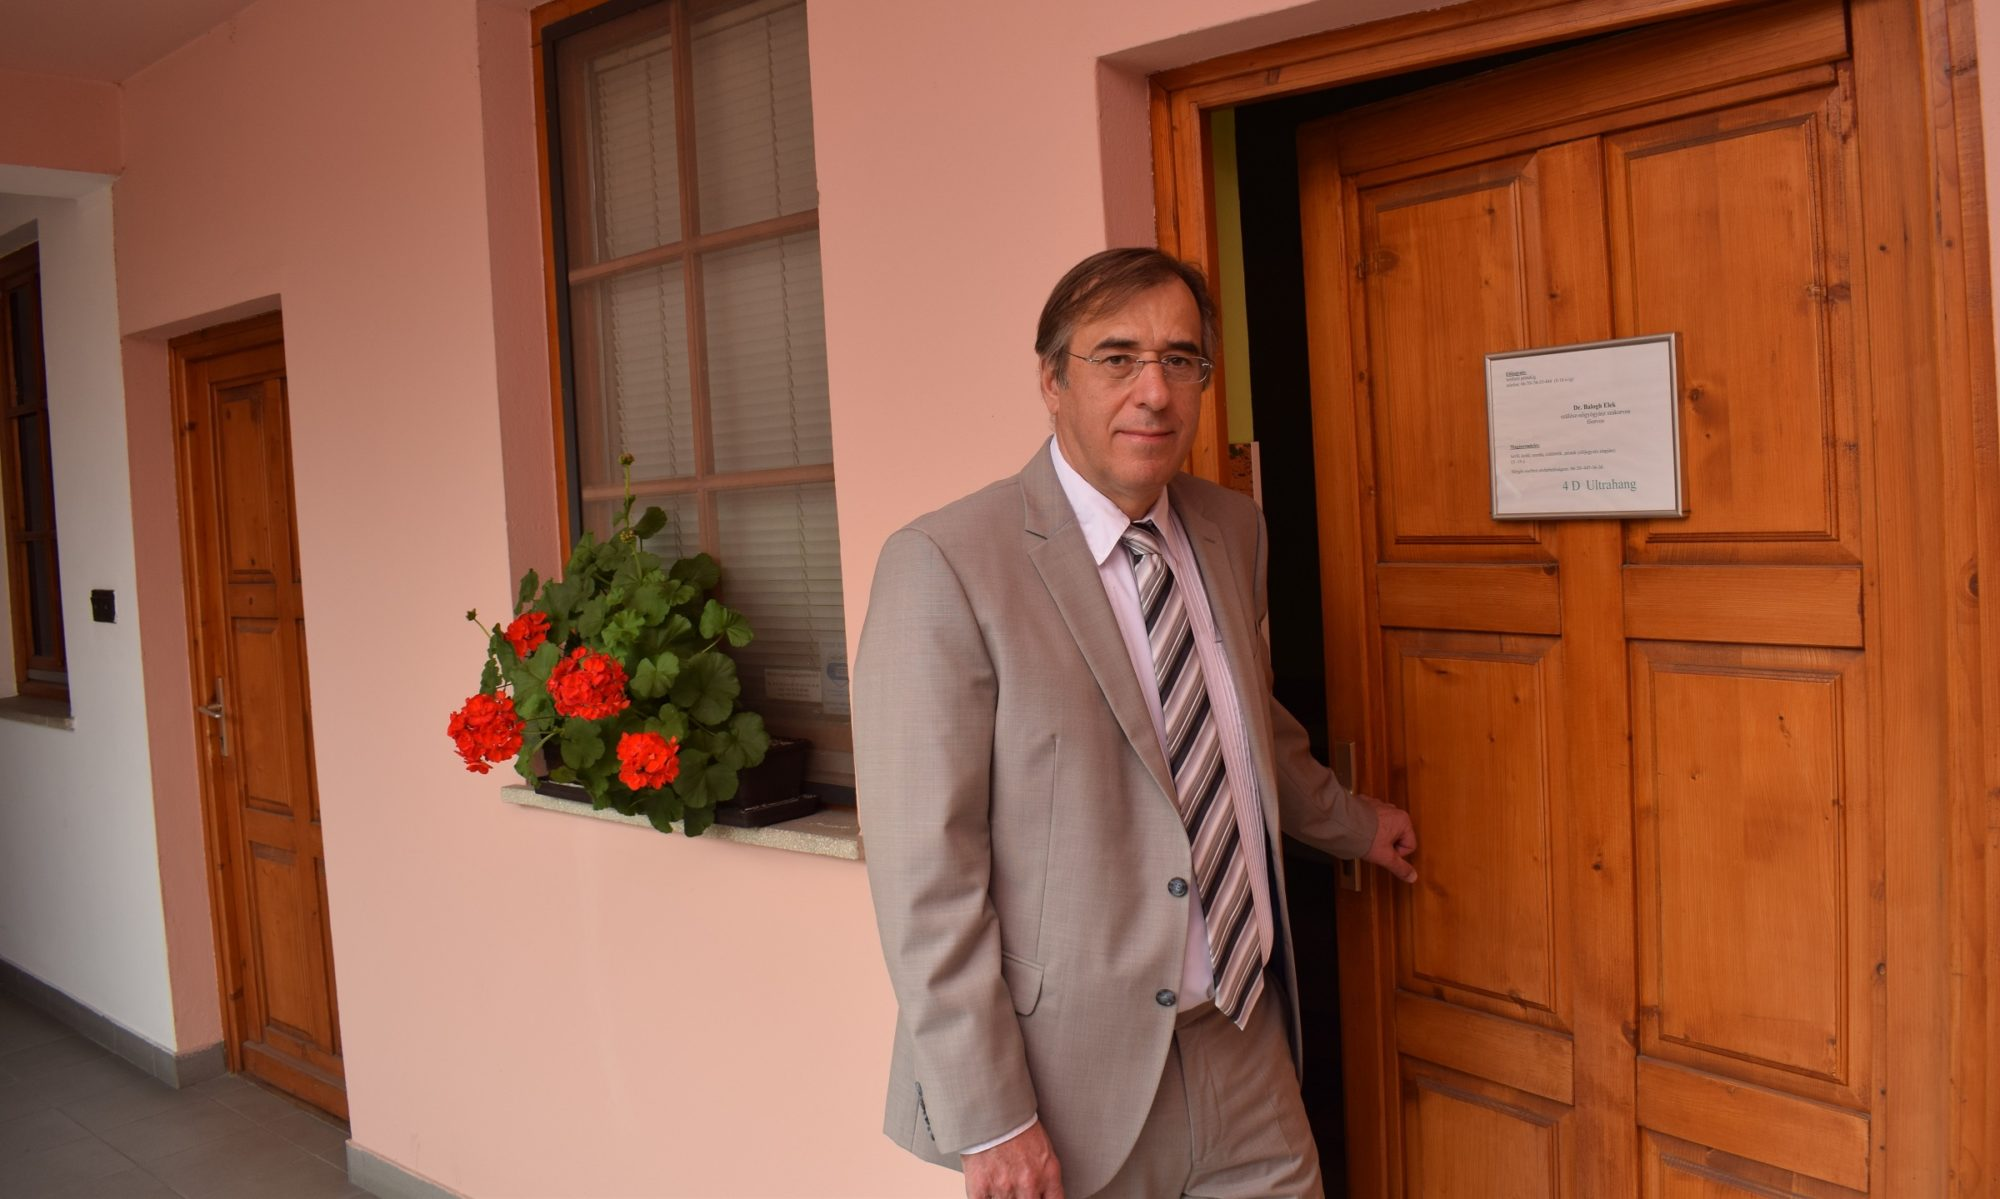 Dr. Balogh Elek